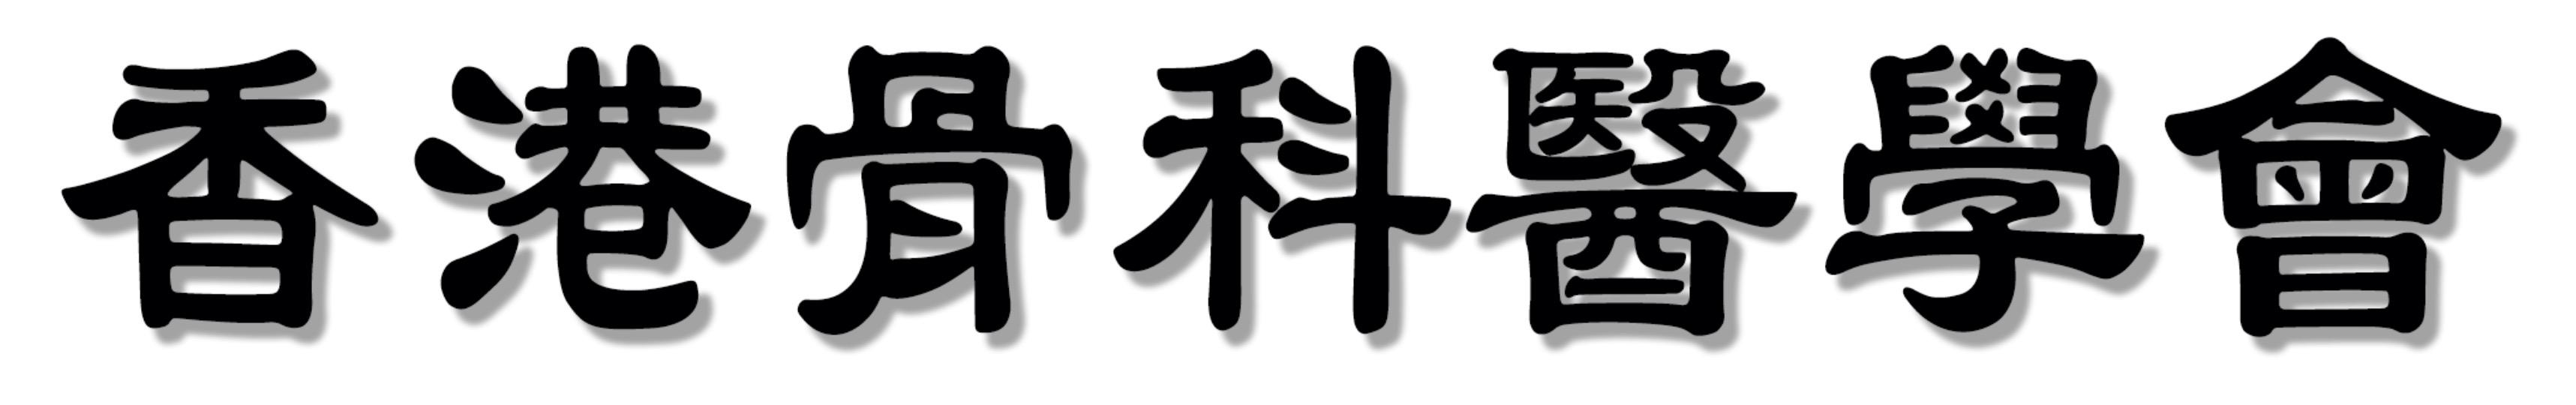 2017 01 The Hong Kong Orthopaedic Association